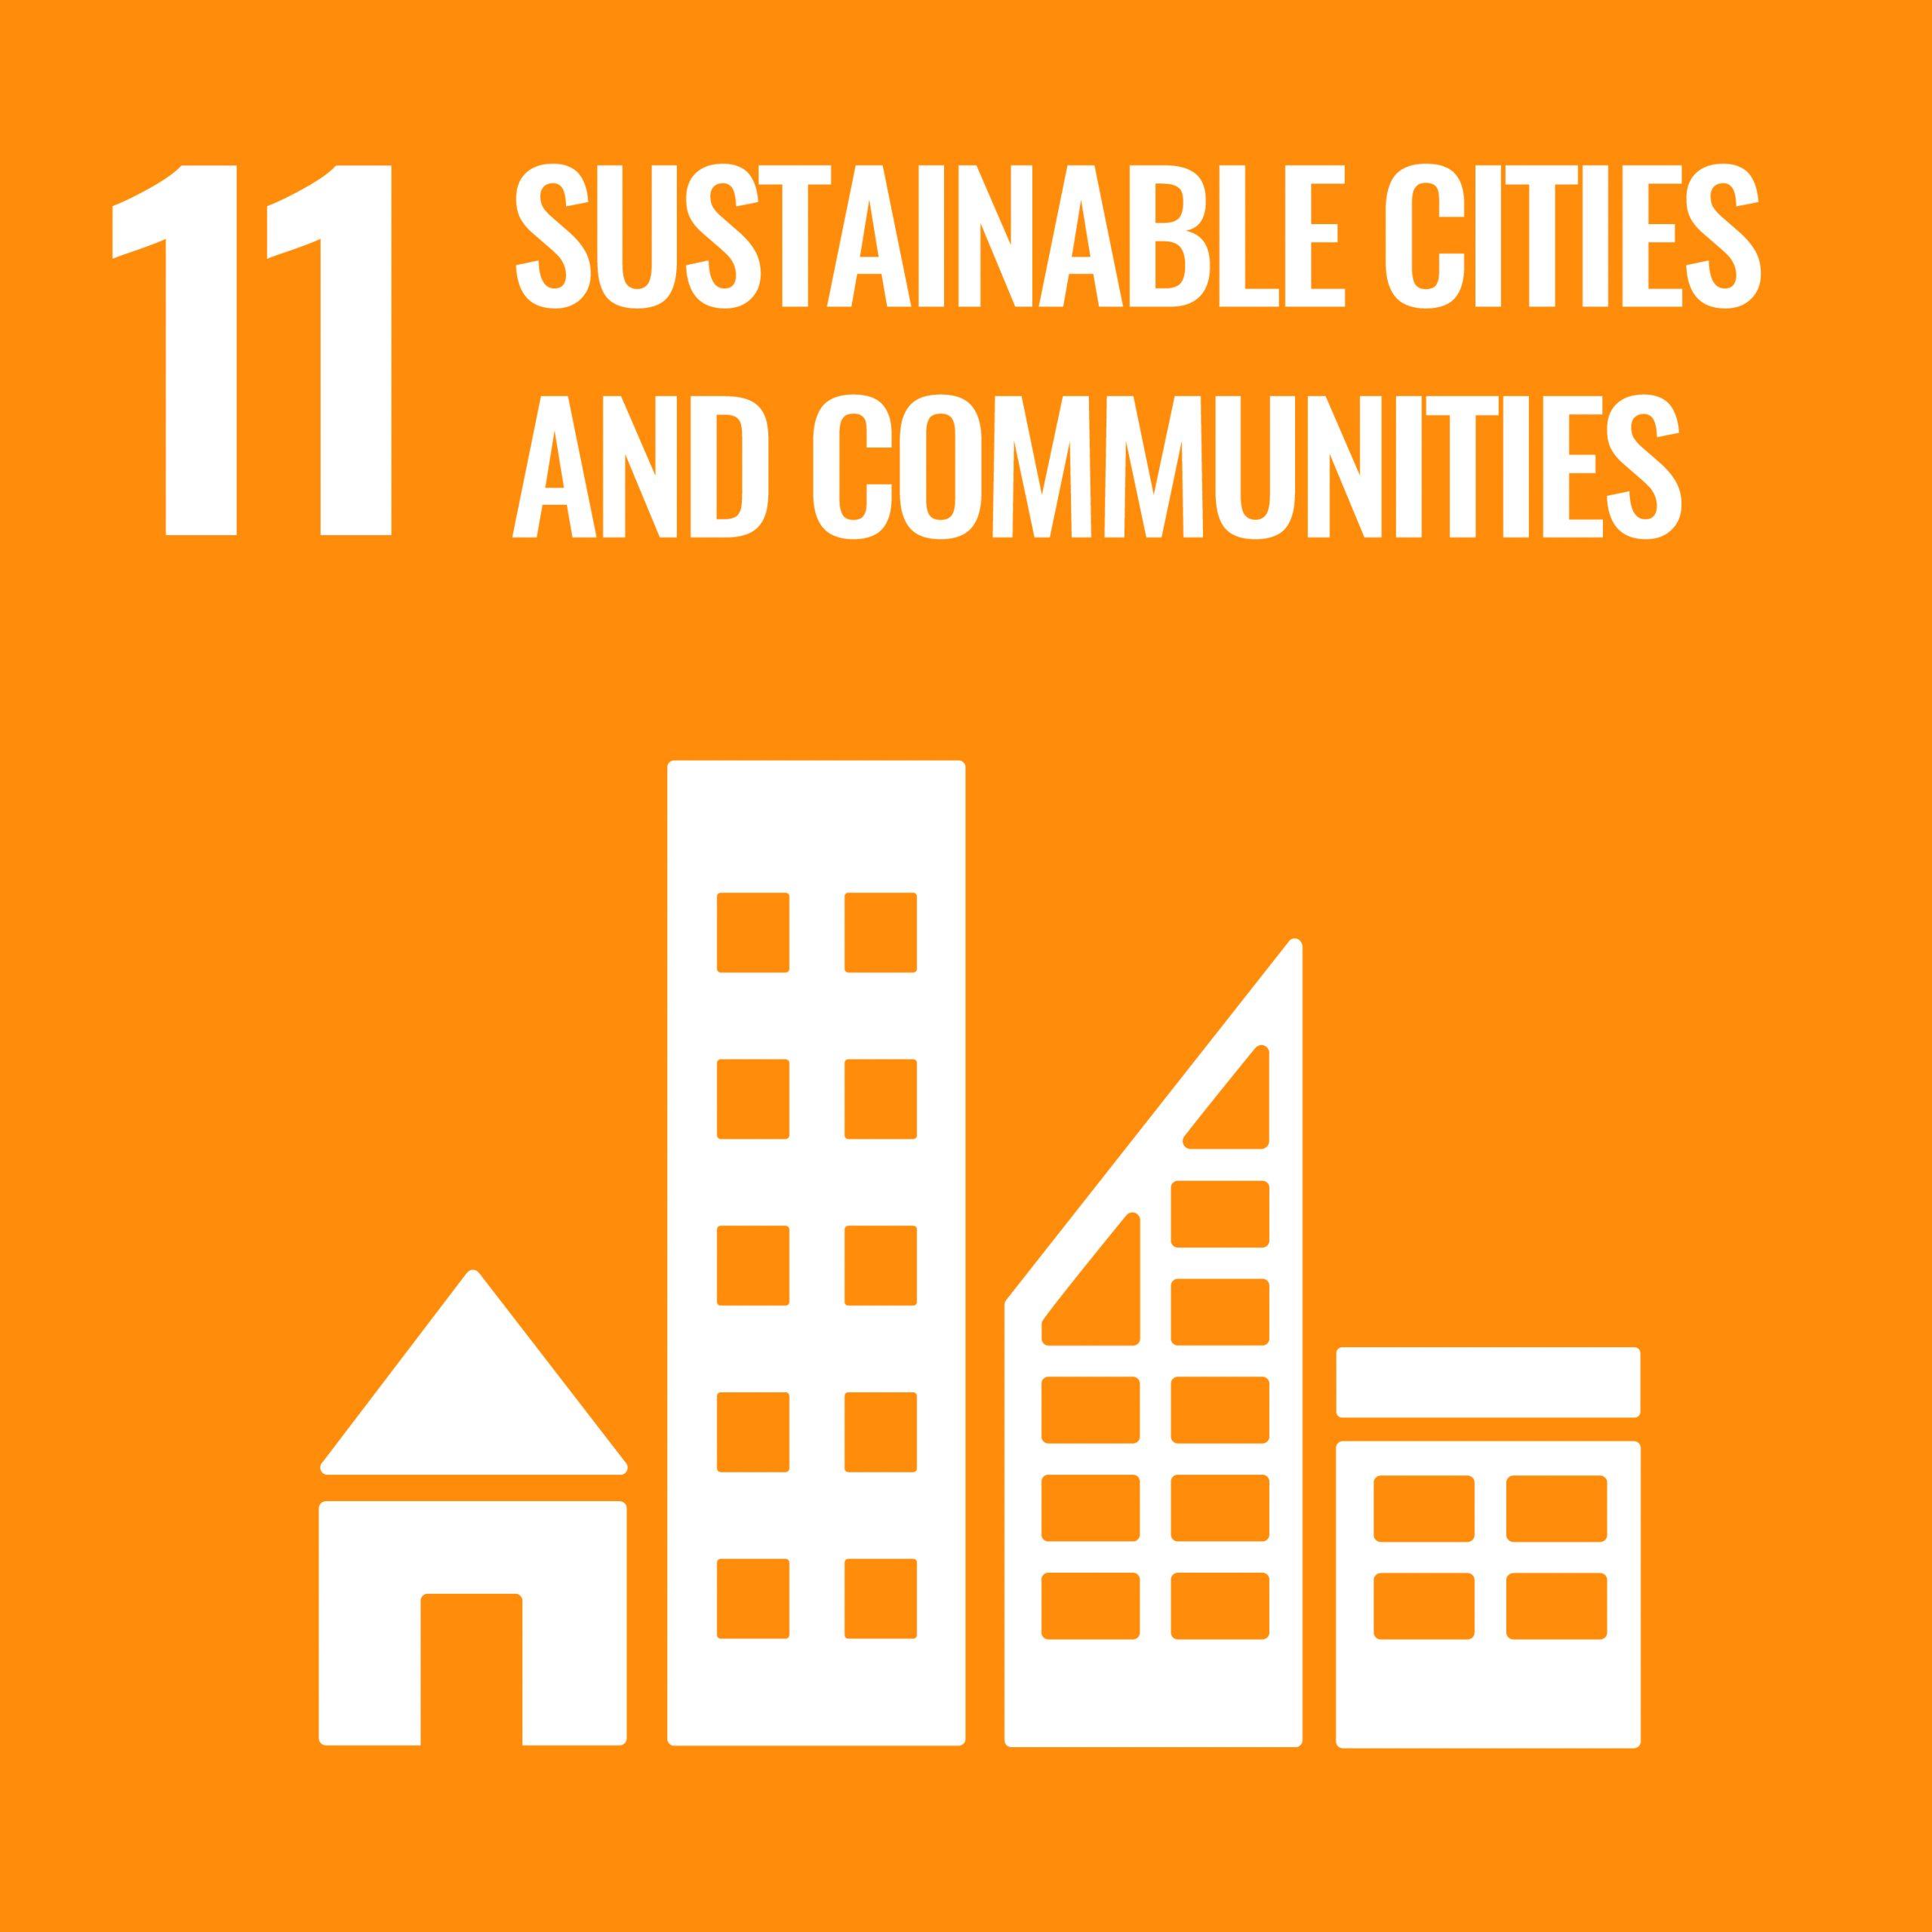 Sustainabile cities and communities - SDG 11